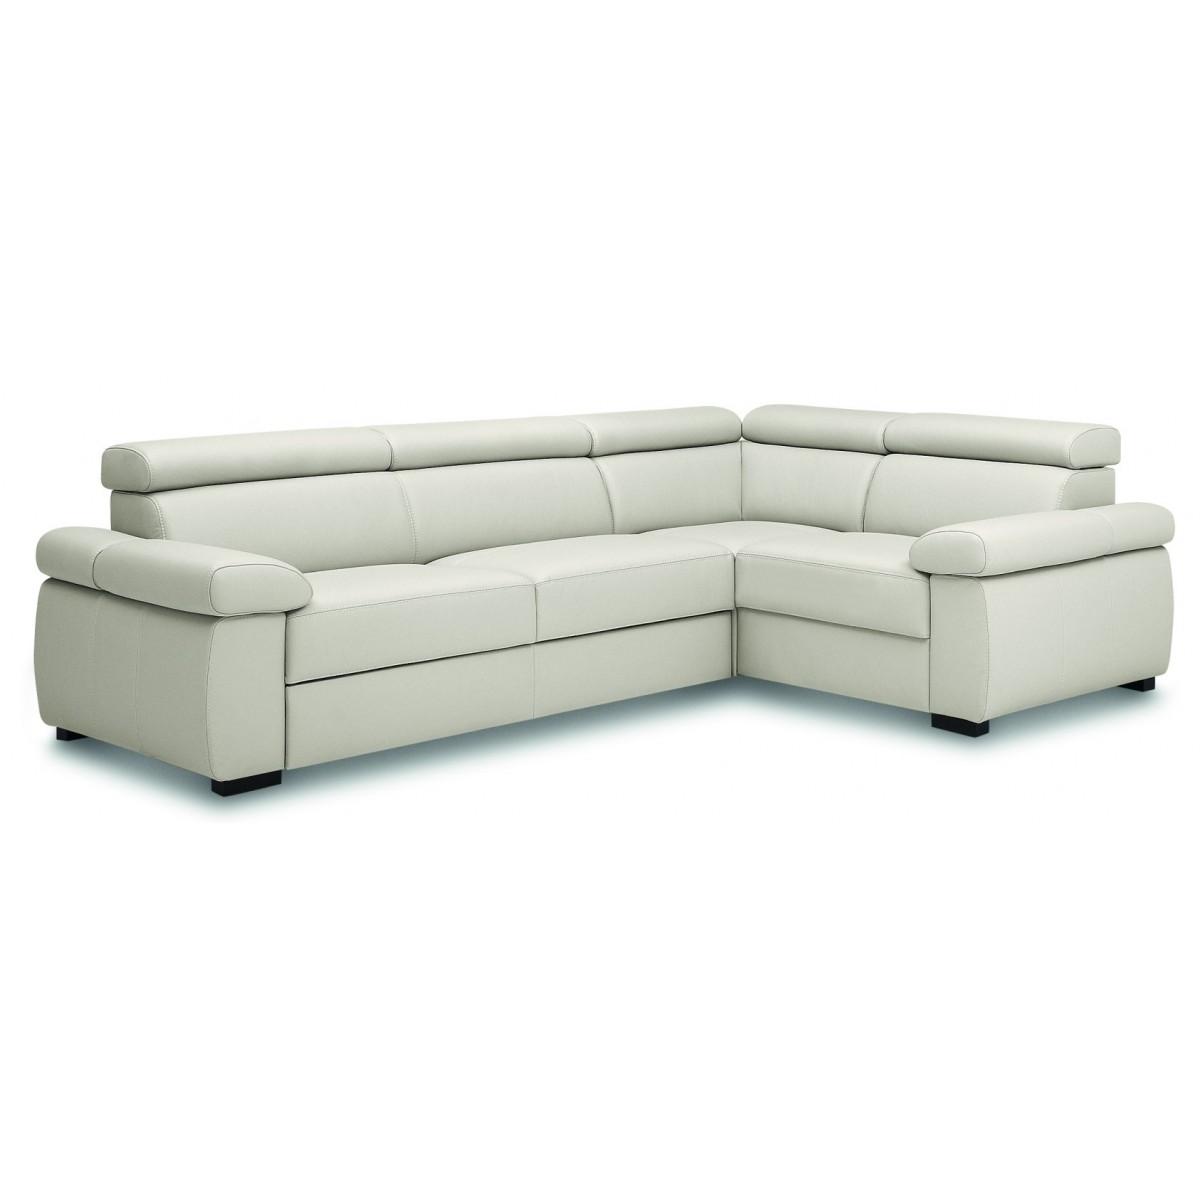 Zoom Narożnik (261x188) Etap Sofa